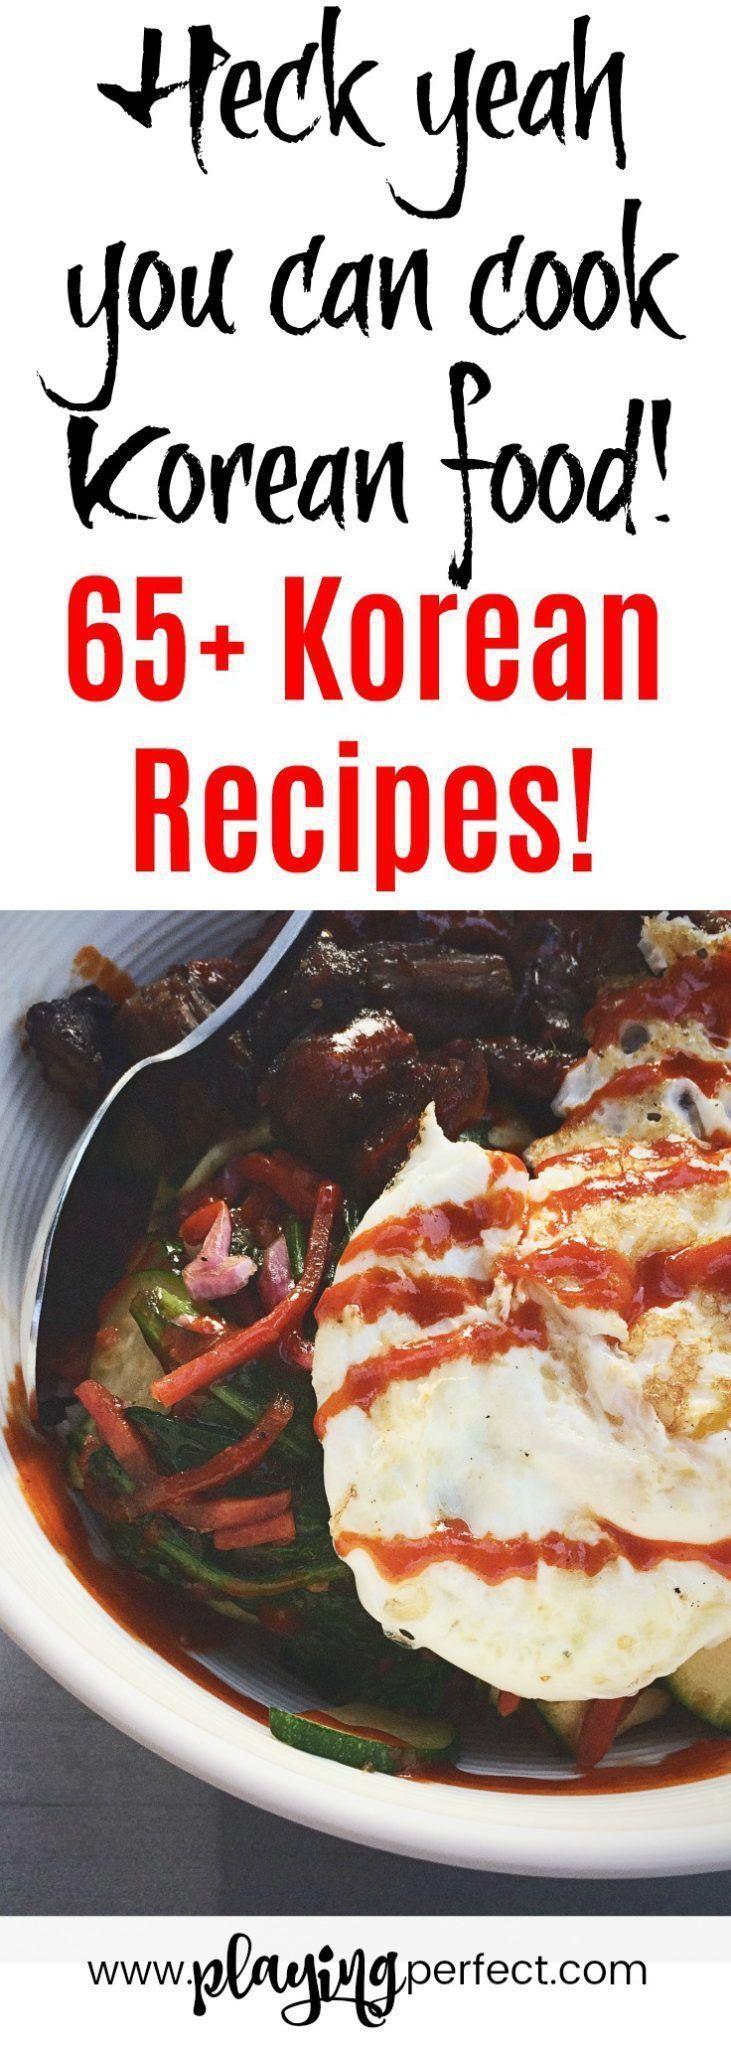 Mejores 10778 imgenes de korean food recipes en pinterest recetas korean recipes korean meal ideas including easy korean food traditional korean food fusion korean food and healthy korean recipes along with korean forumfinder Images